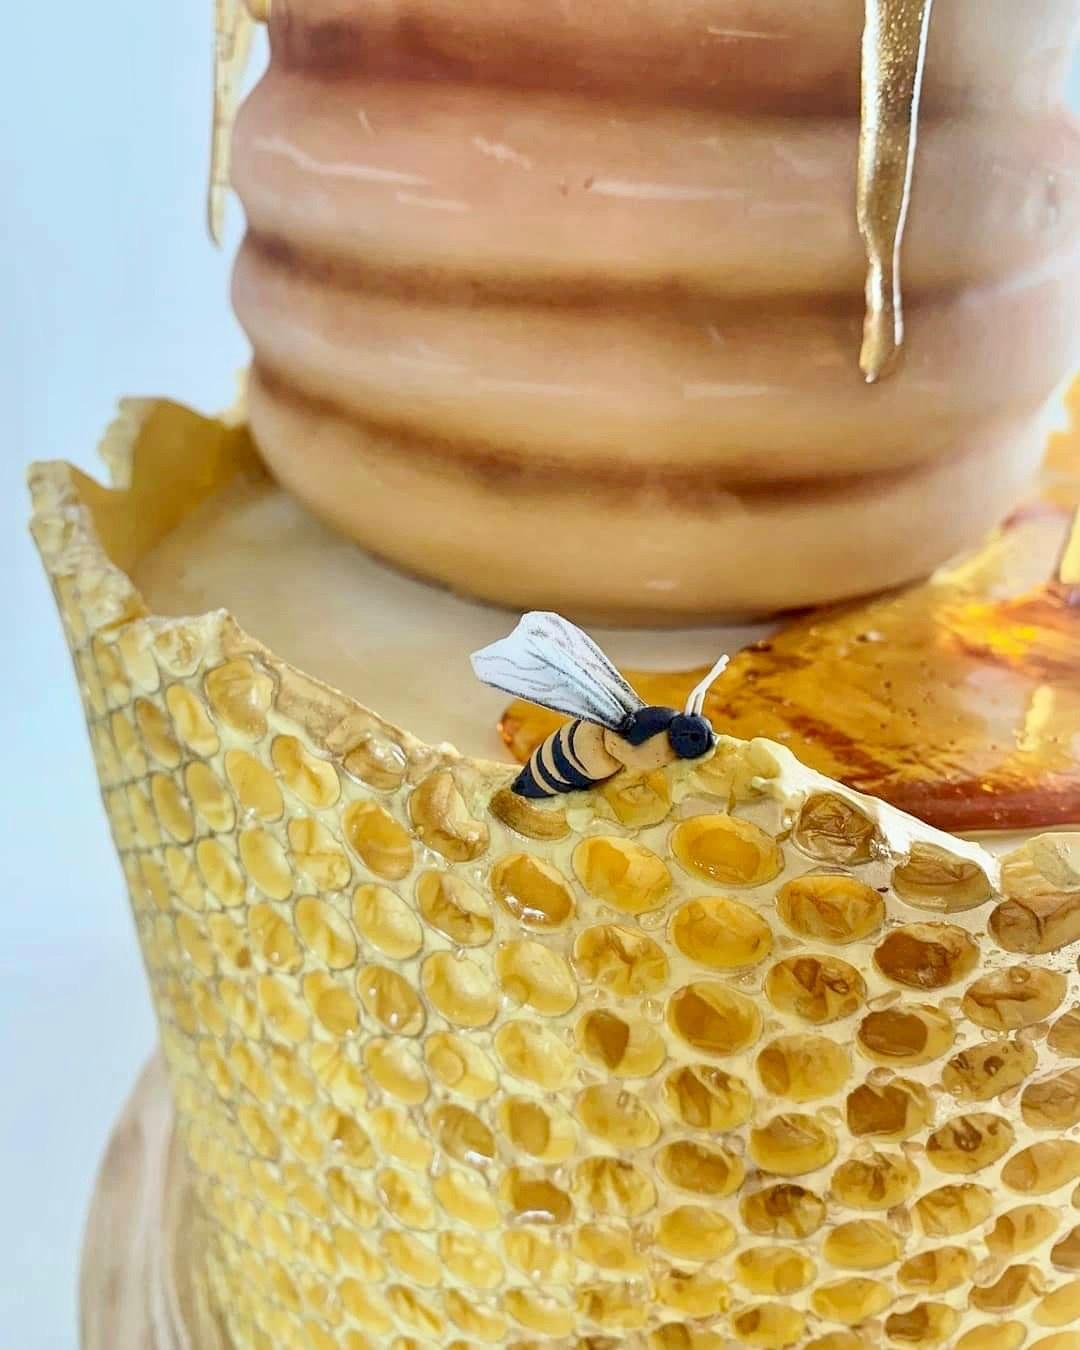 Honeycomb patterned fondant cake